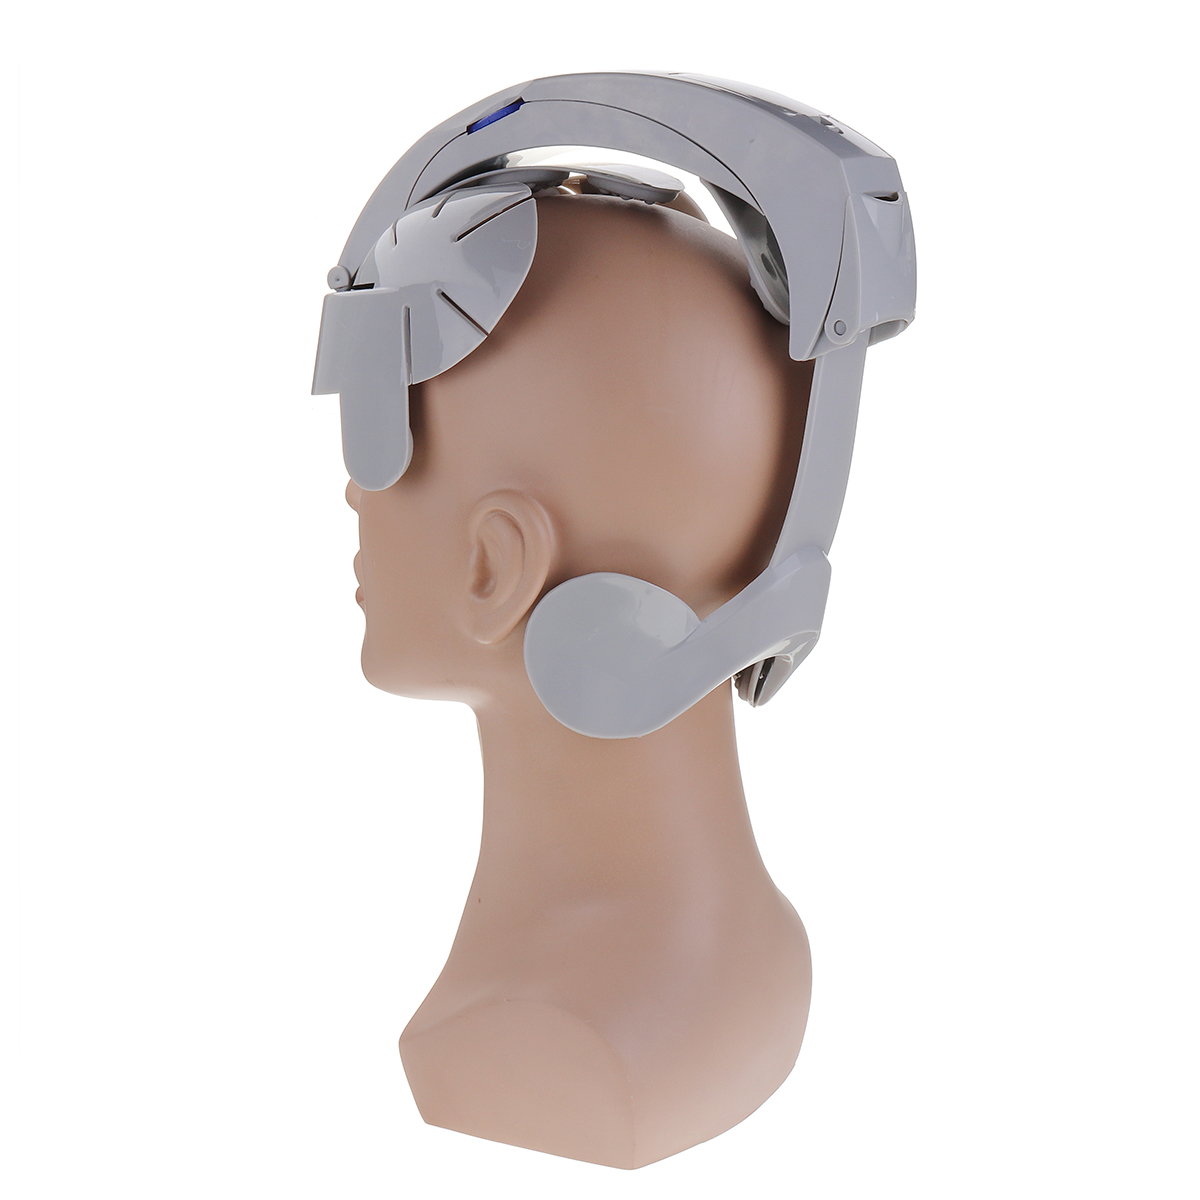 Head Vibration Easy-brain Massager Electric Head Massager ...